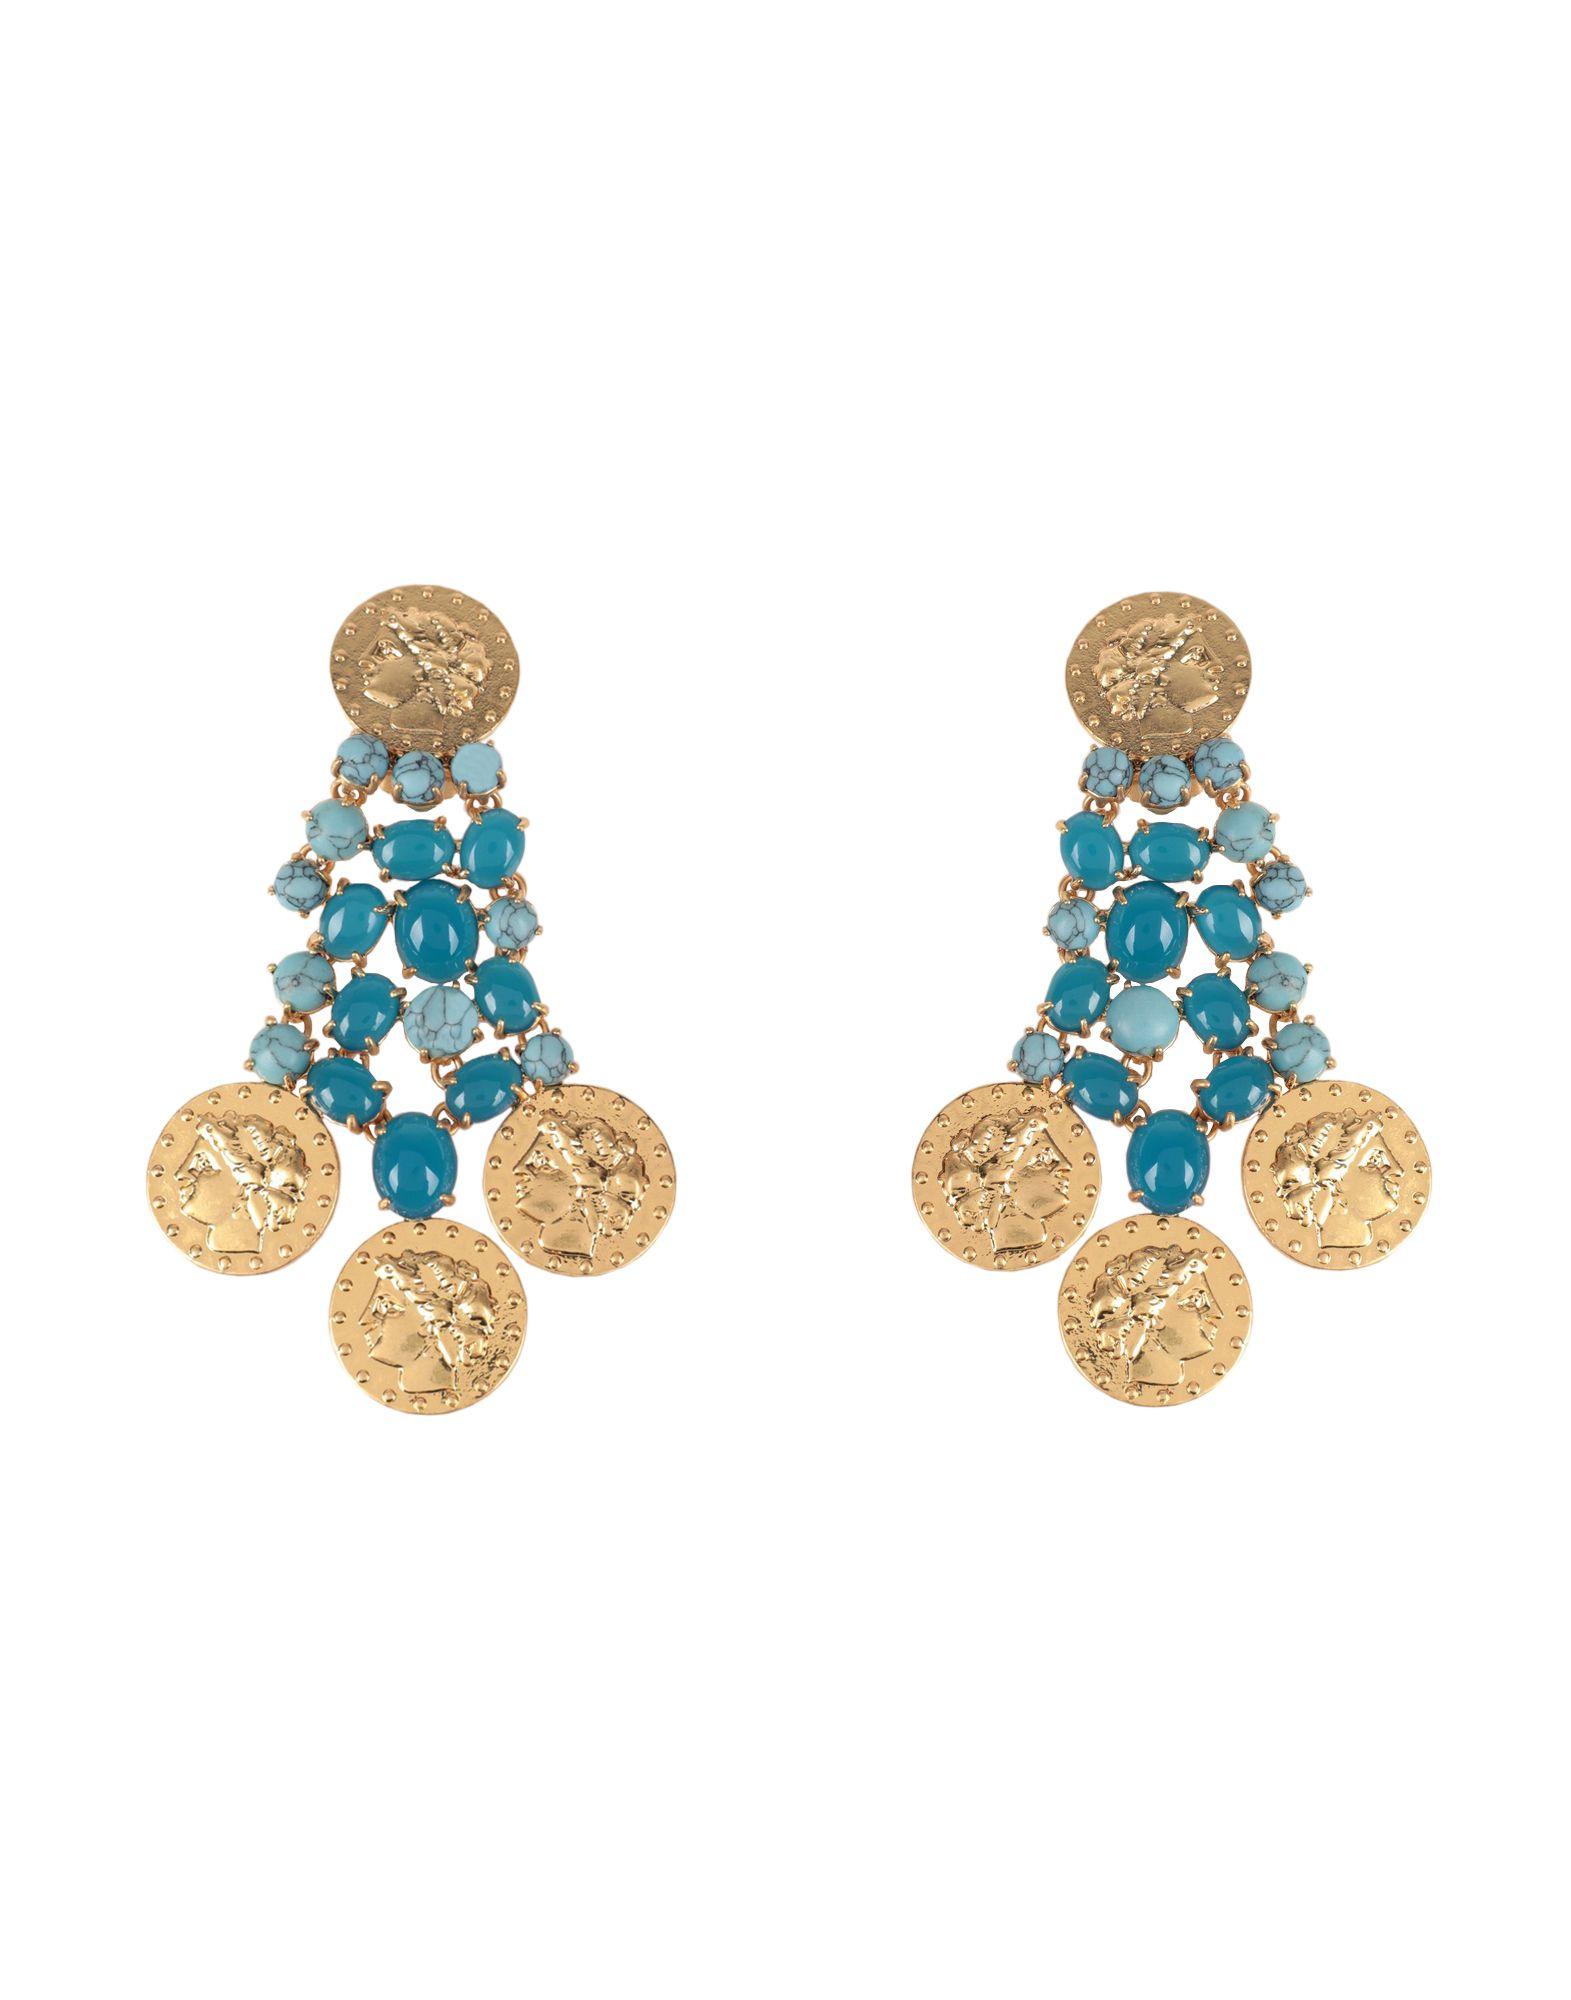 TORY BURCH Earrings - Item 50239682